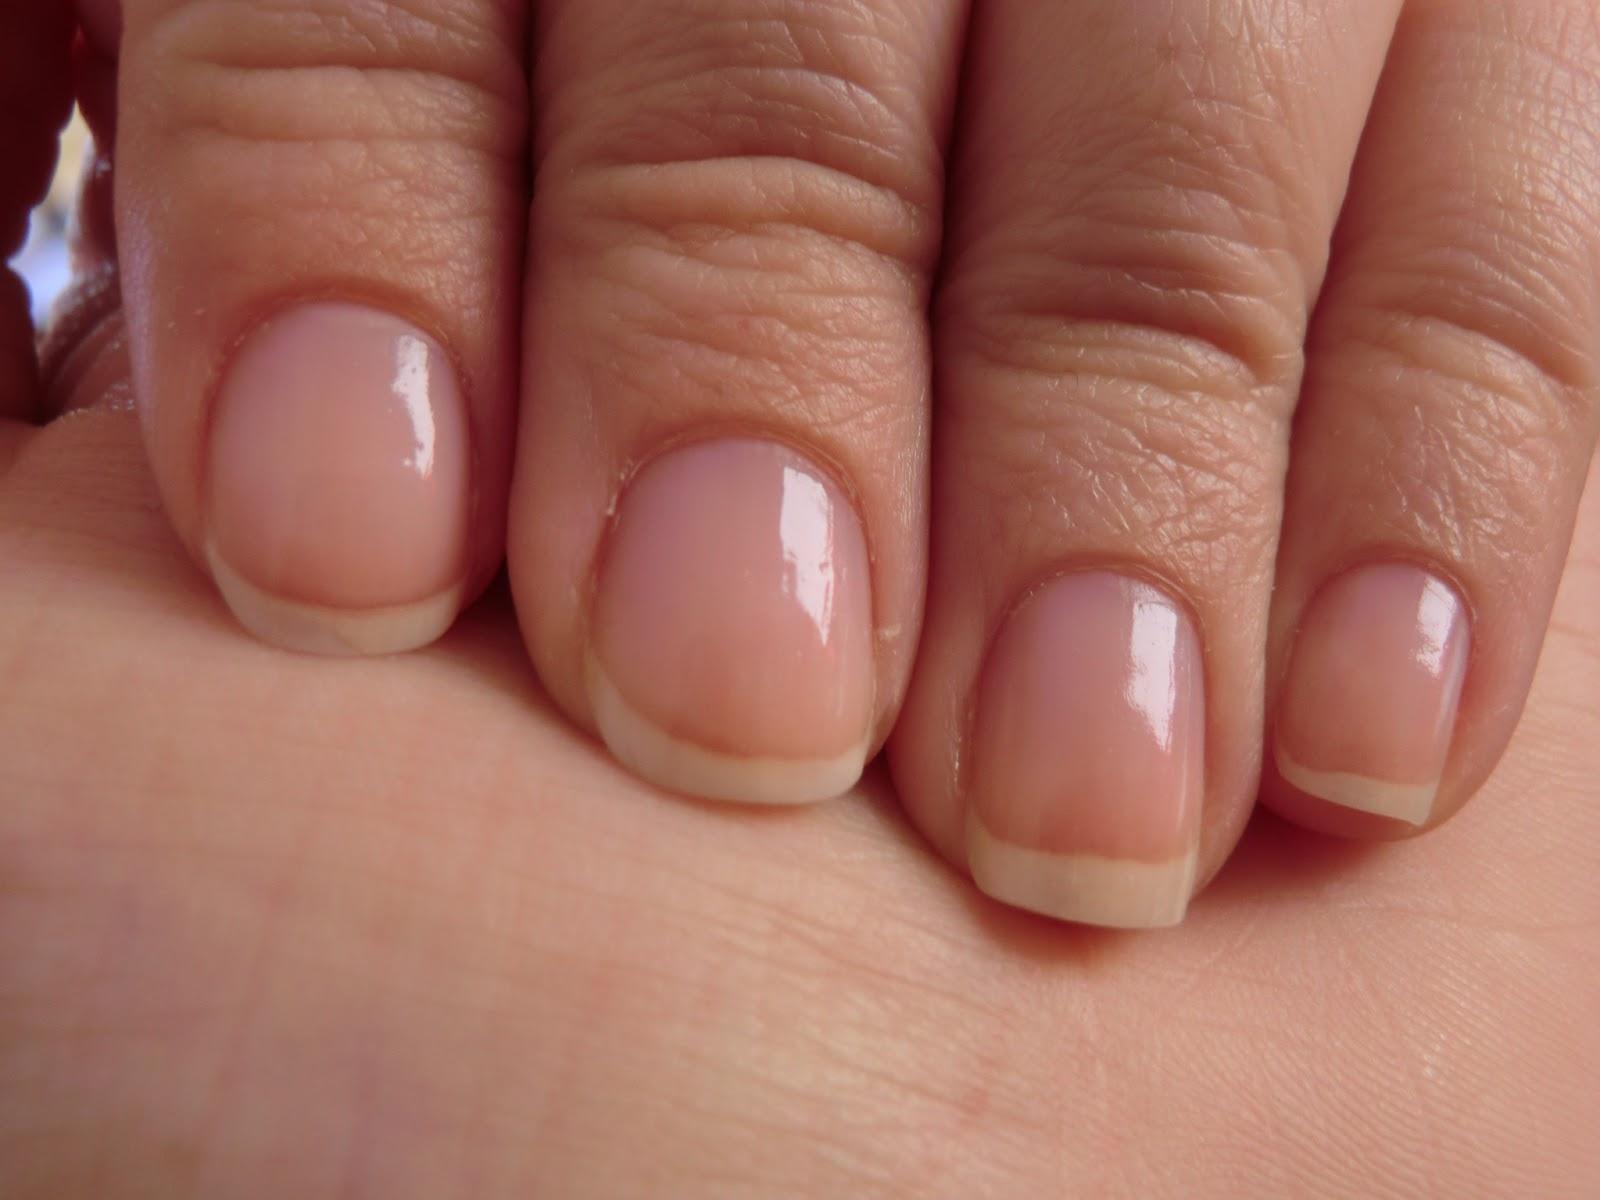 nageldesign nagelformen